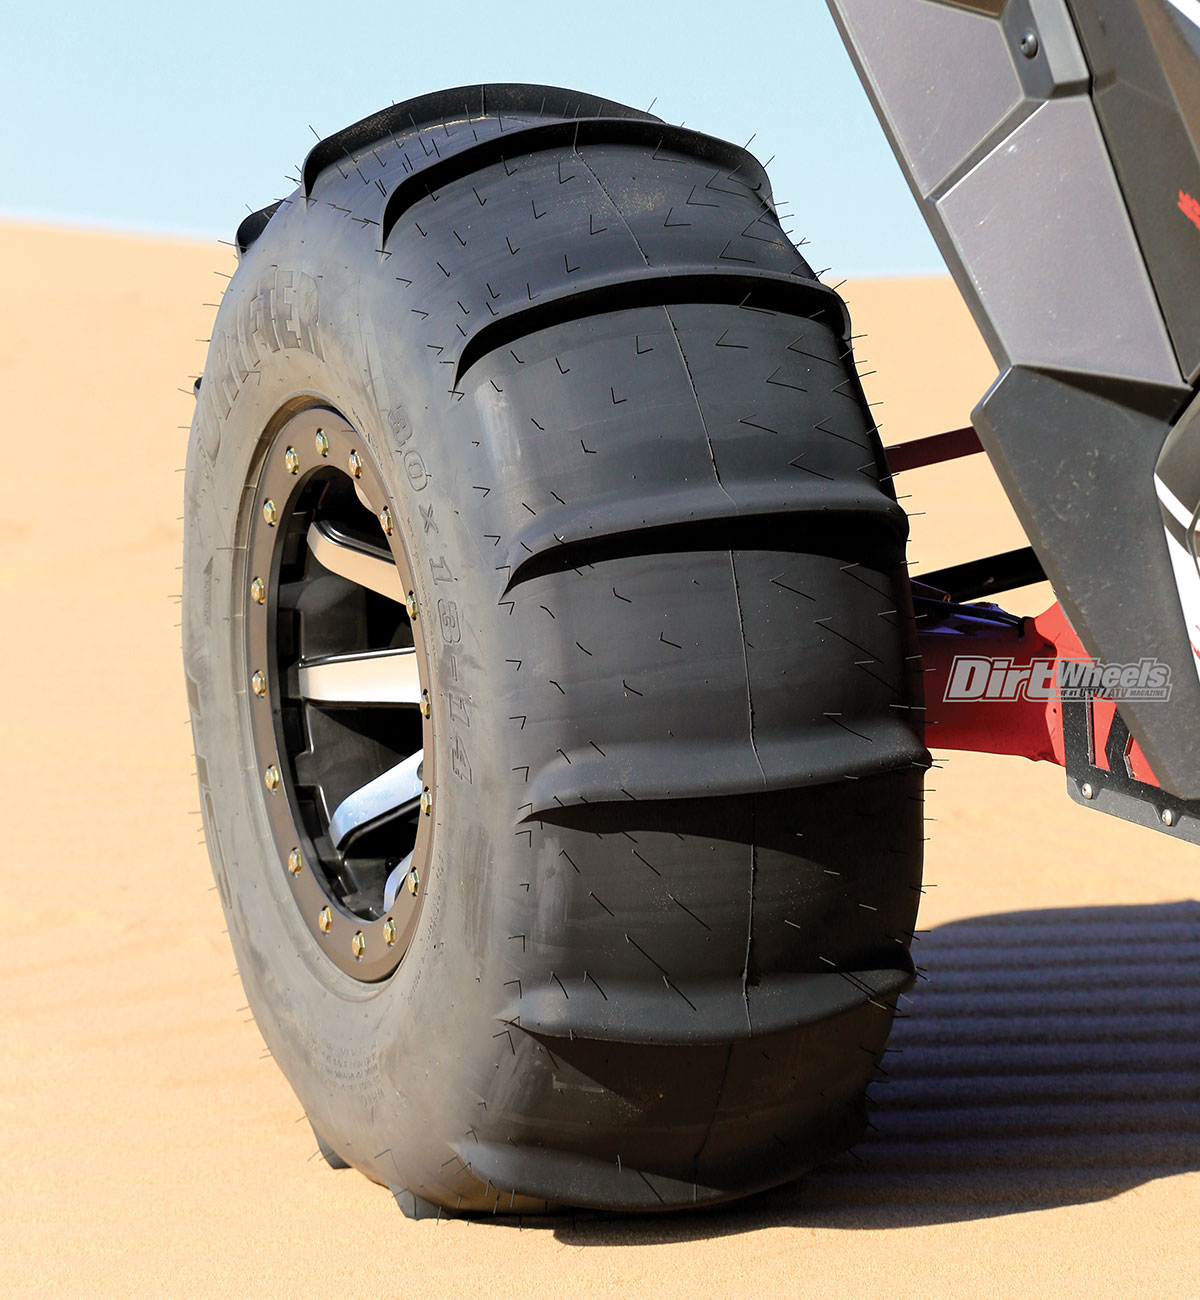 sti hd9 comp lock wide wheels sand drifter tires dirt wheels magazine. Black Bedroom Furniture Sets. Home Design Ideas